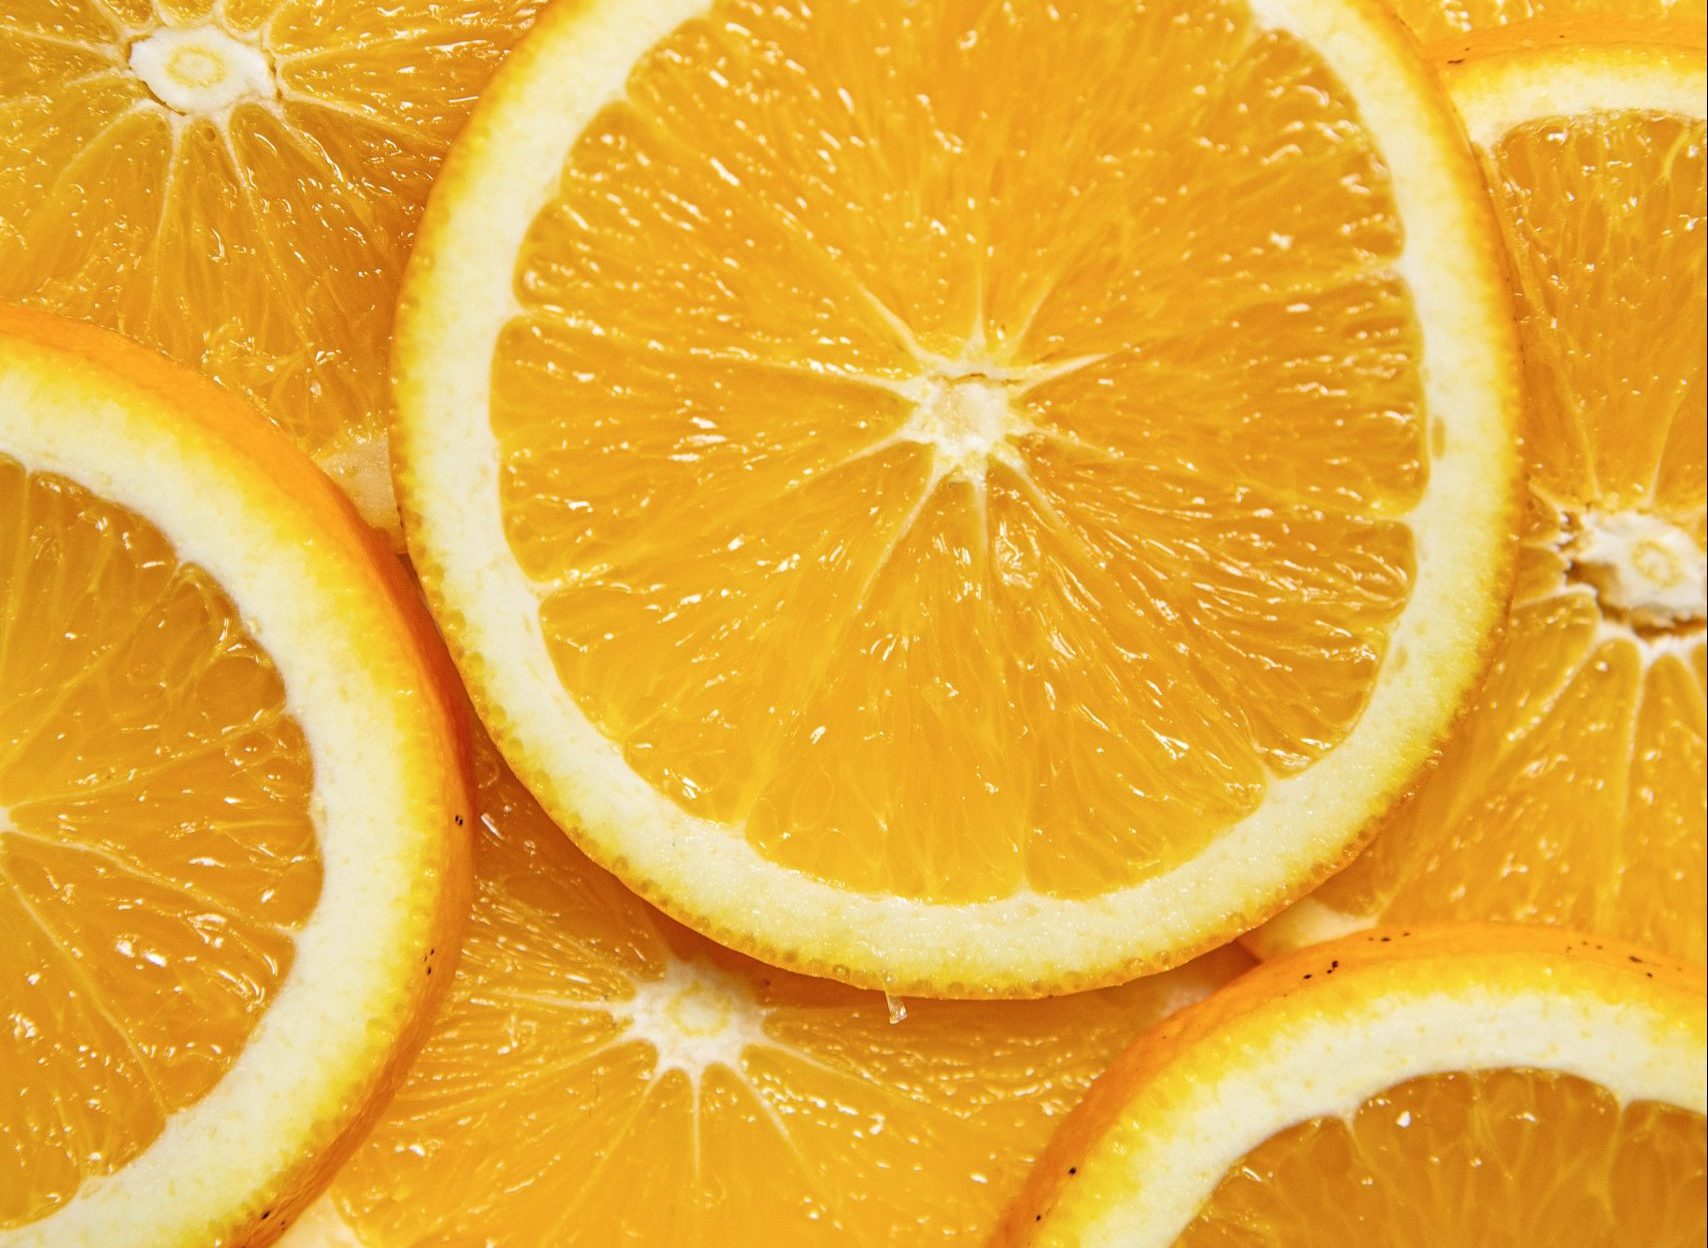 appelsin (Foto: Unsplash)